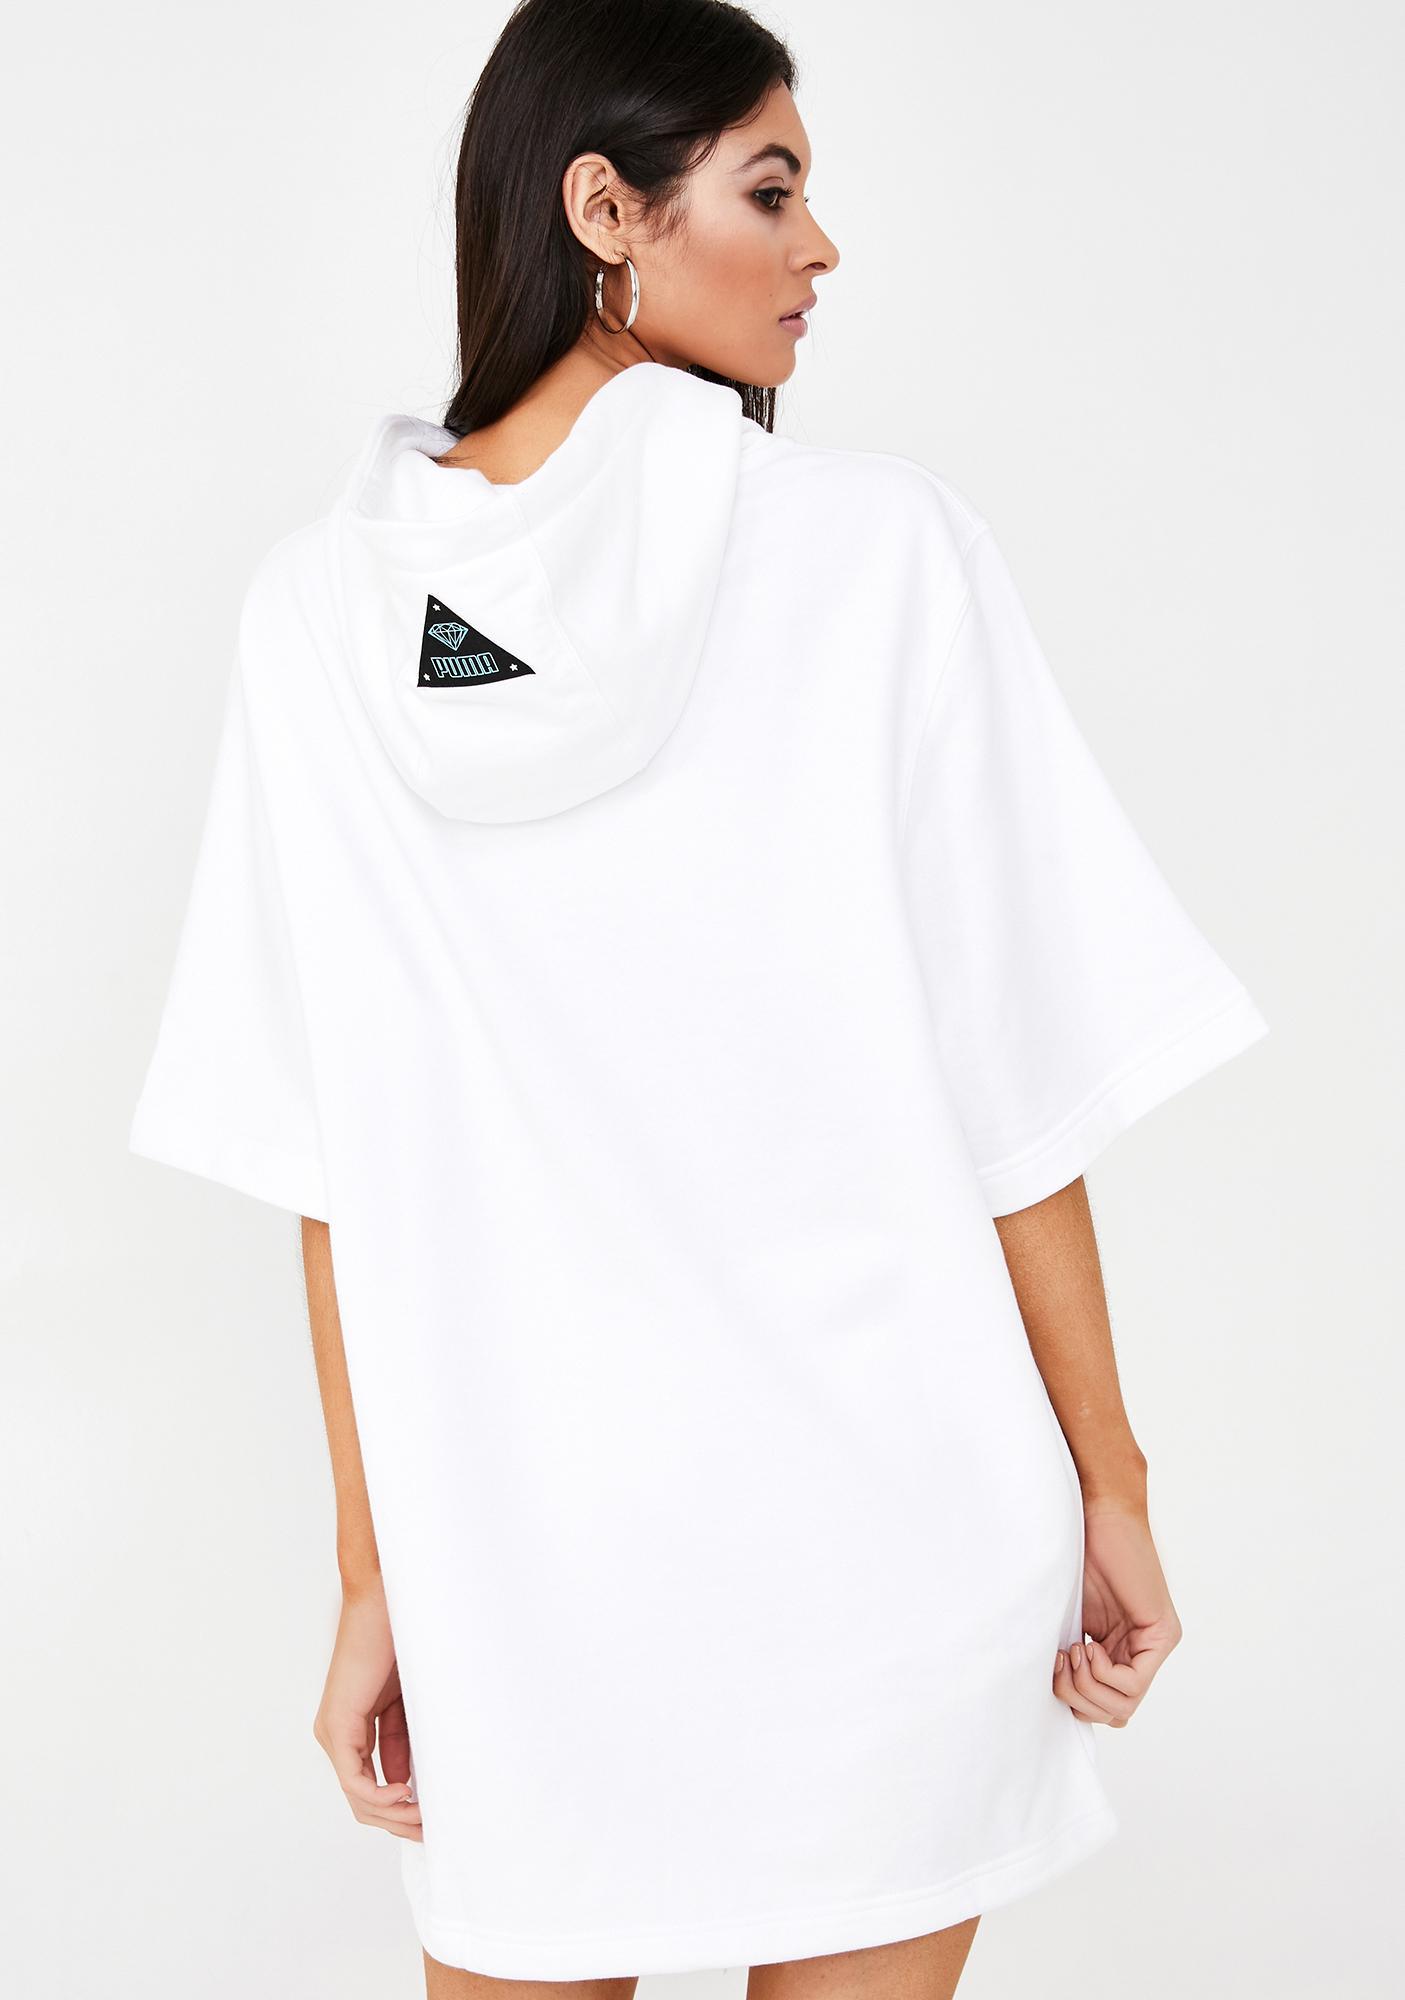 PUMA X Diamond Supply Co Short Sleeve Hoodie